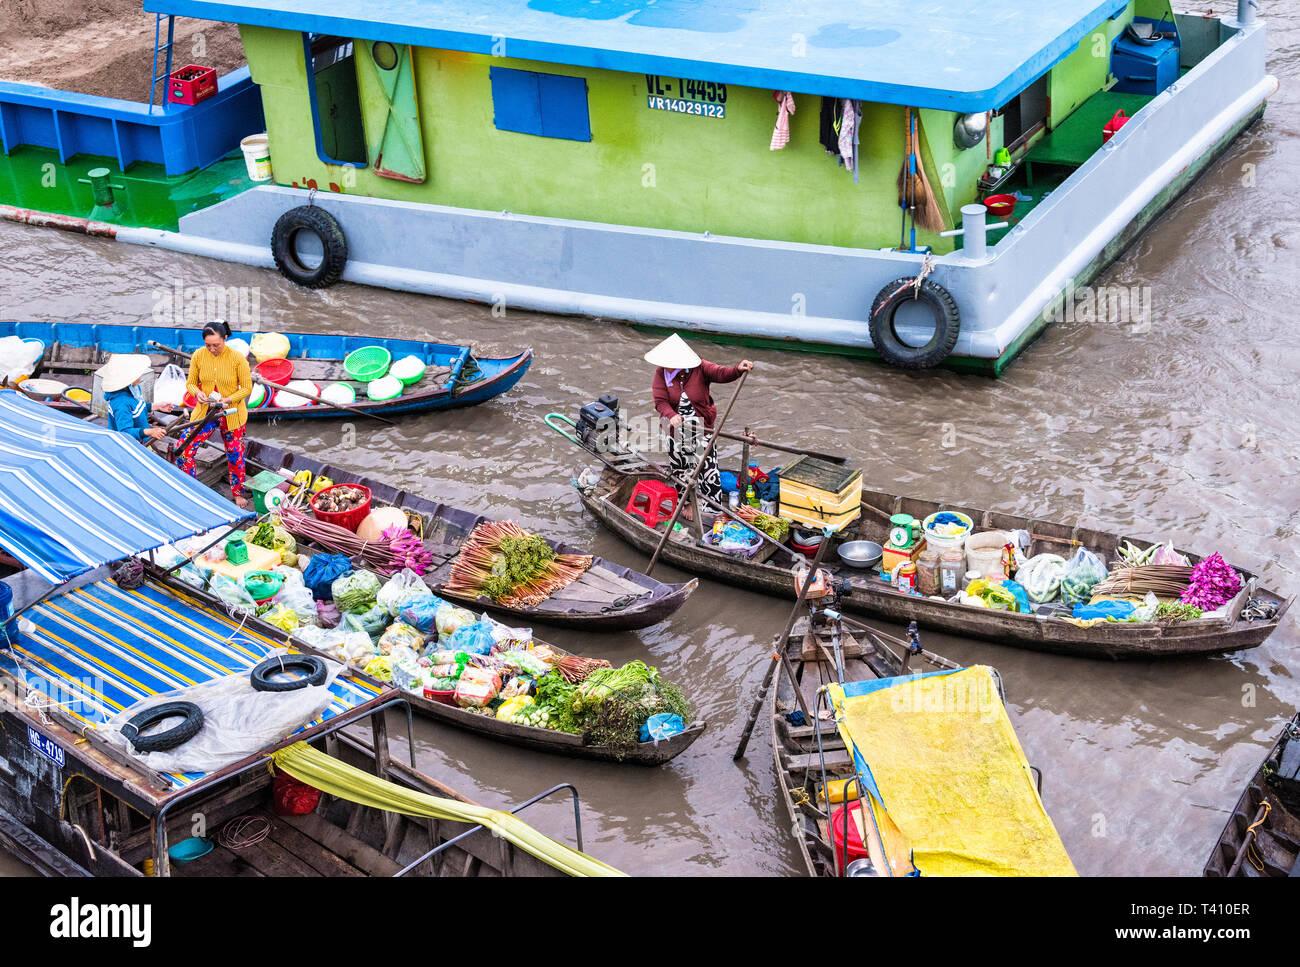 Early morning floating market in Mekong Delta, Vietnam - Stock Image